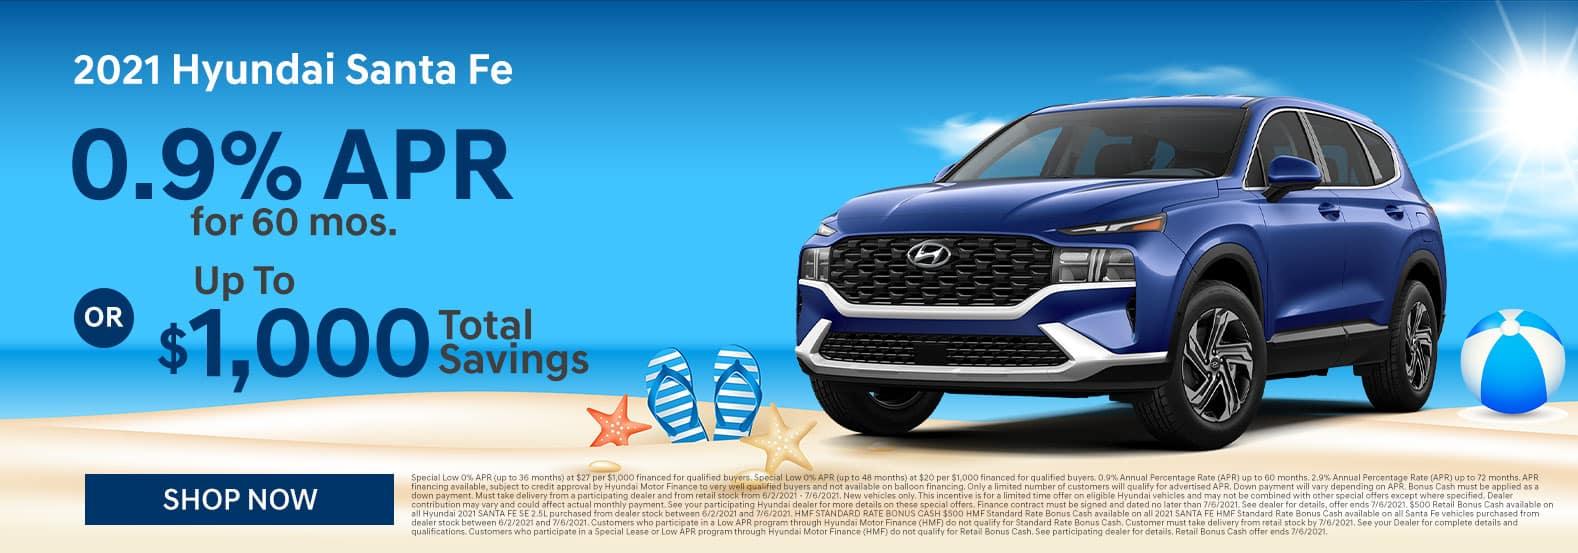 2021 Hyundai Santa Fe June Offer